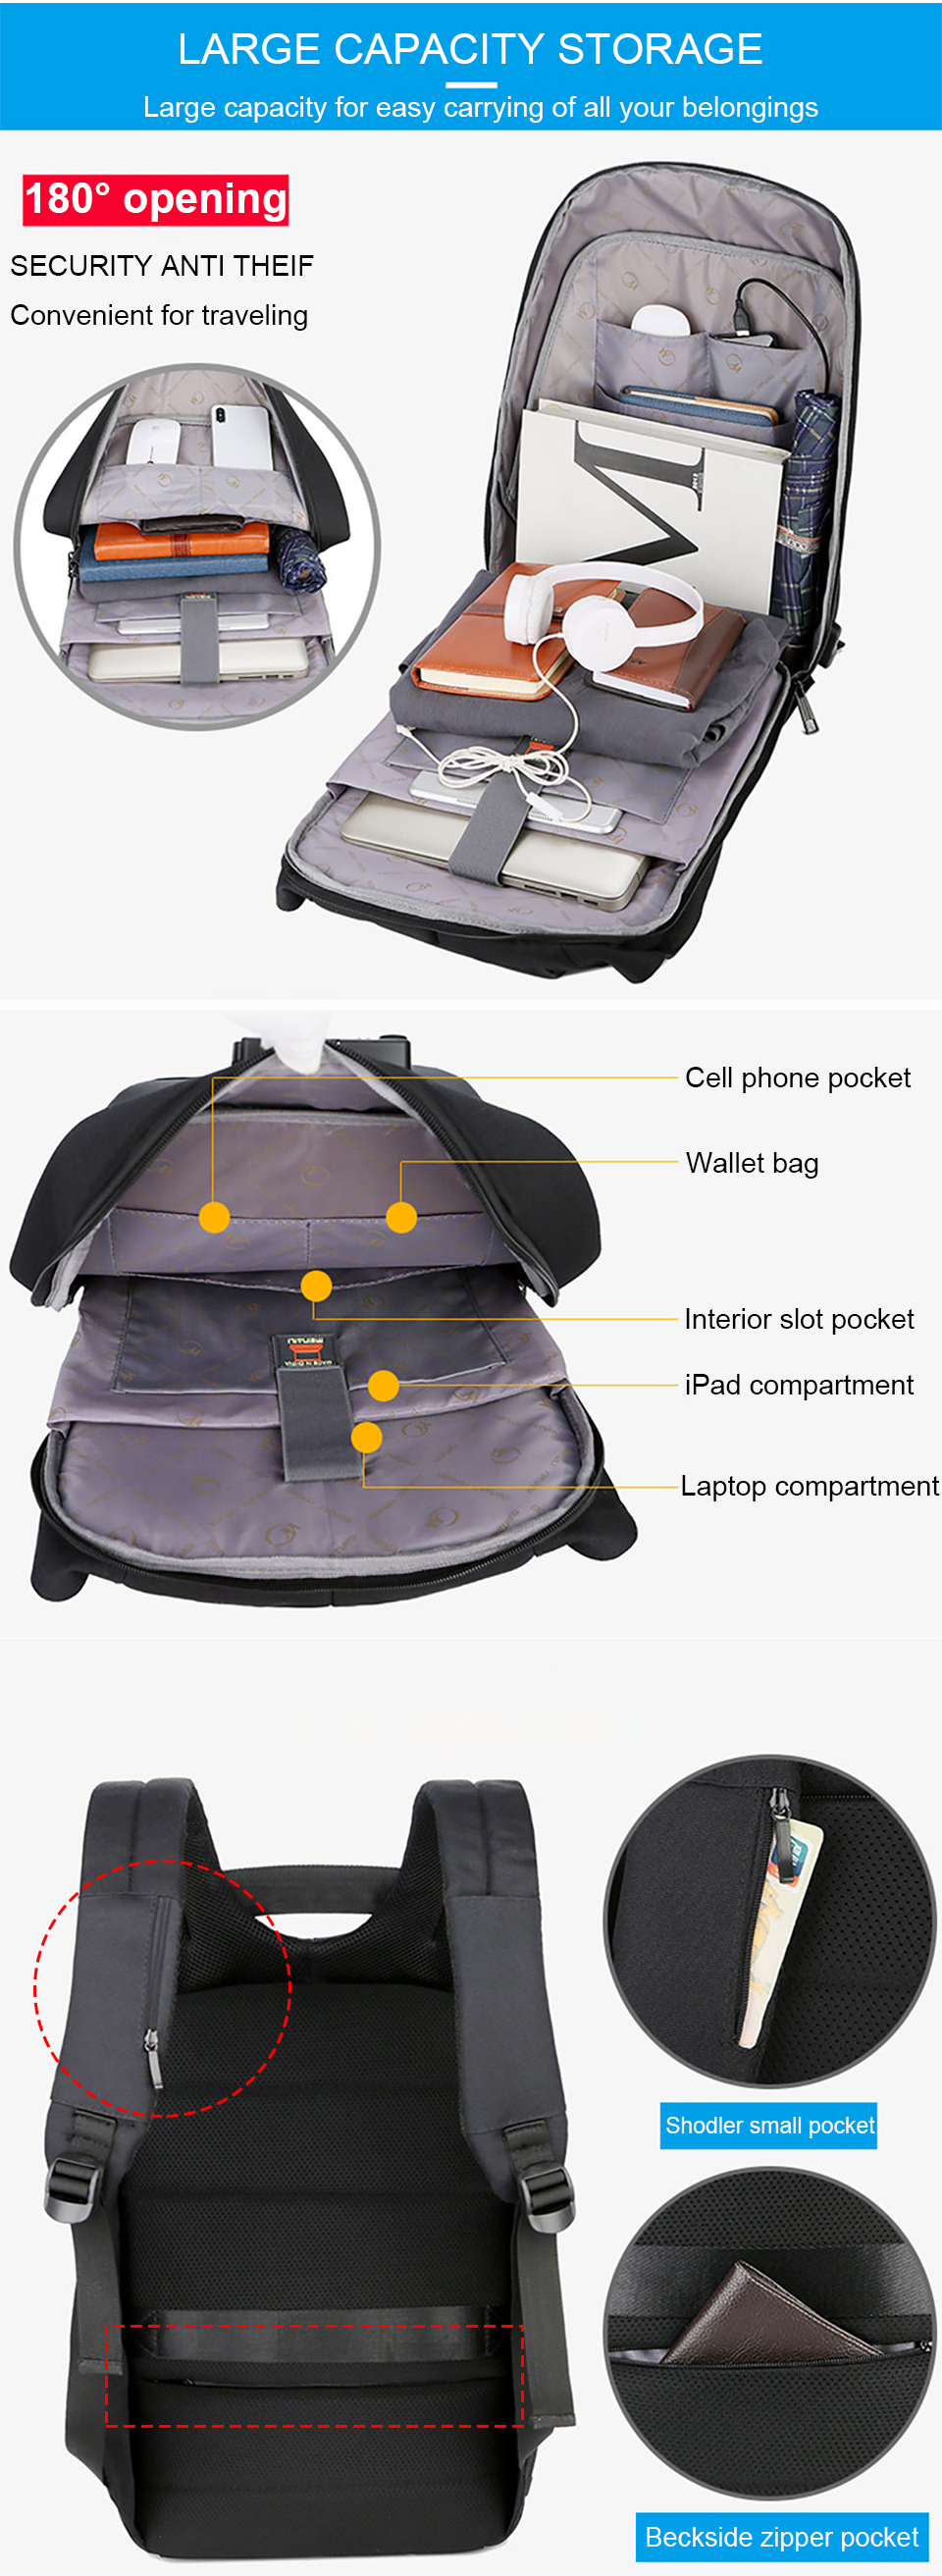 2 Anti-theft Backpack Men Backpacks Laptop 15.6'' Business Travel Luggage Bag Pack Waterproof USB Password Lock Male Backpacking